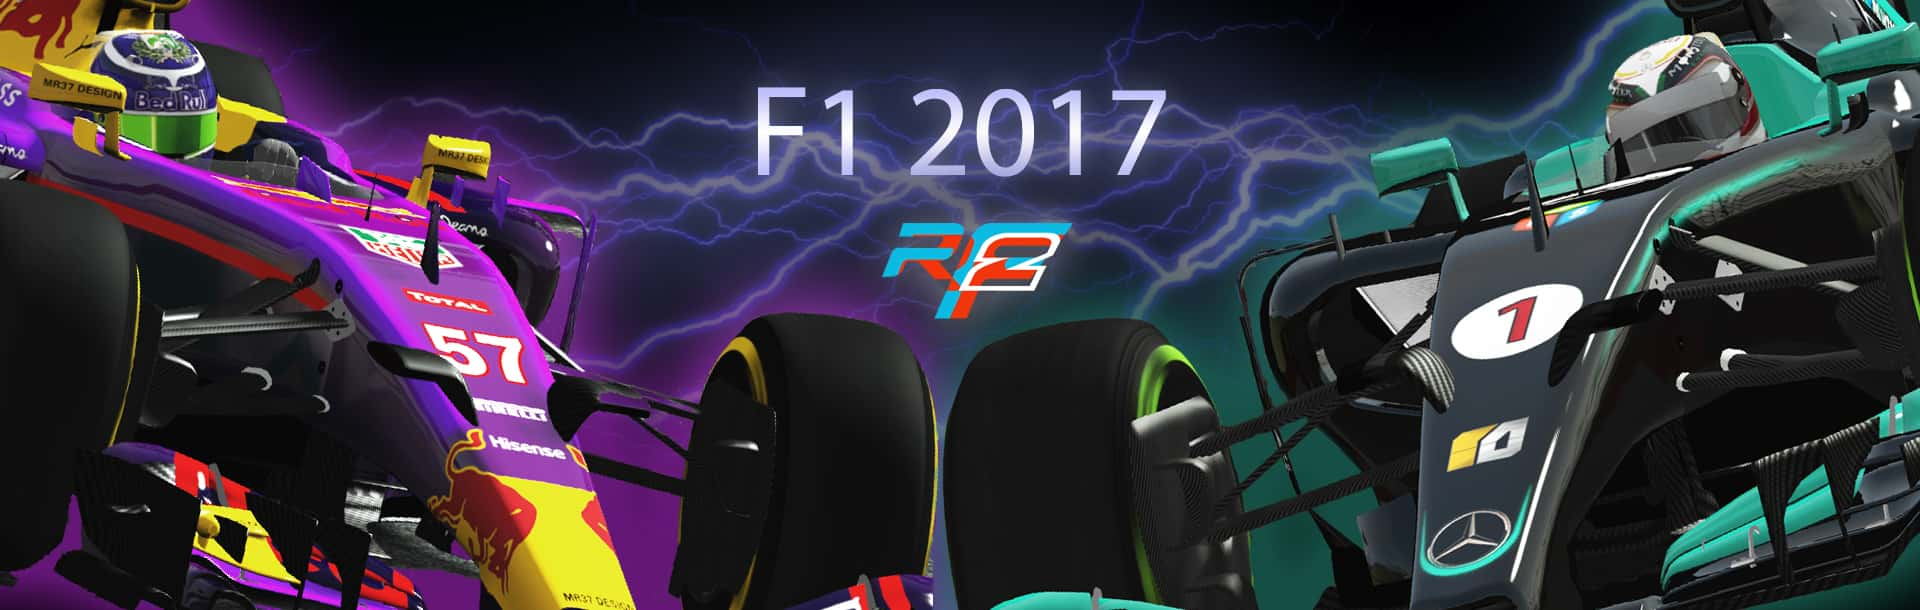 Campionato F1 2017 – rFactor2